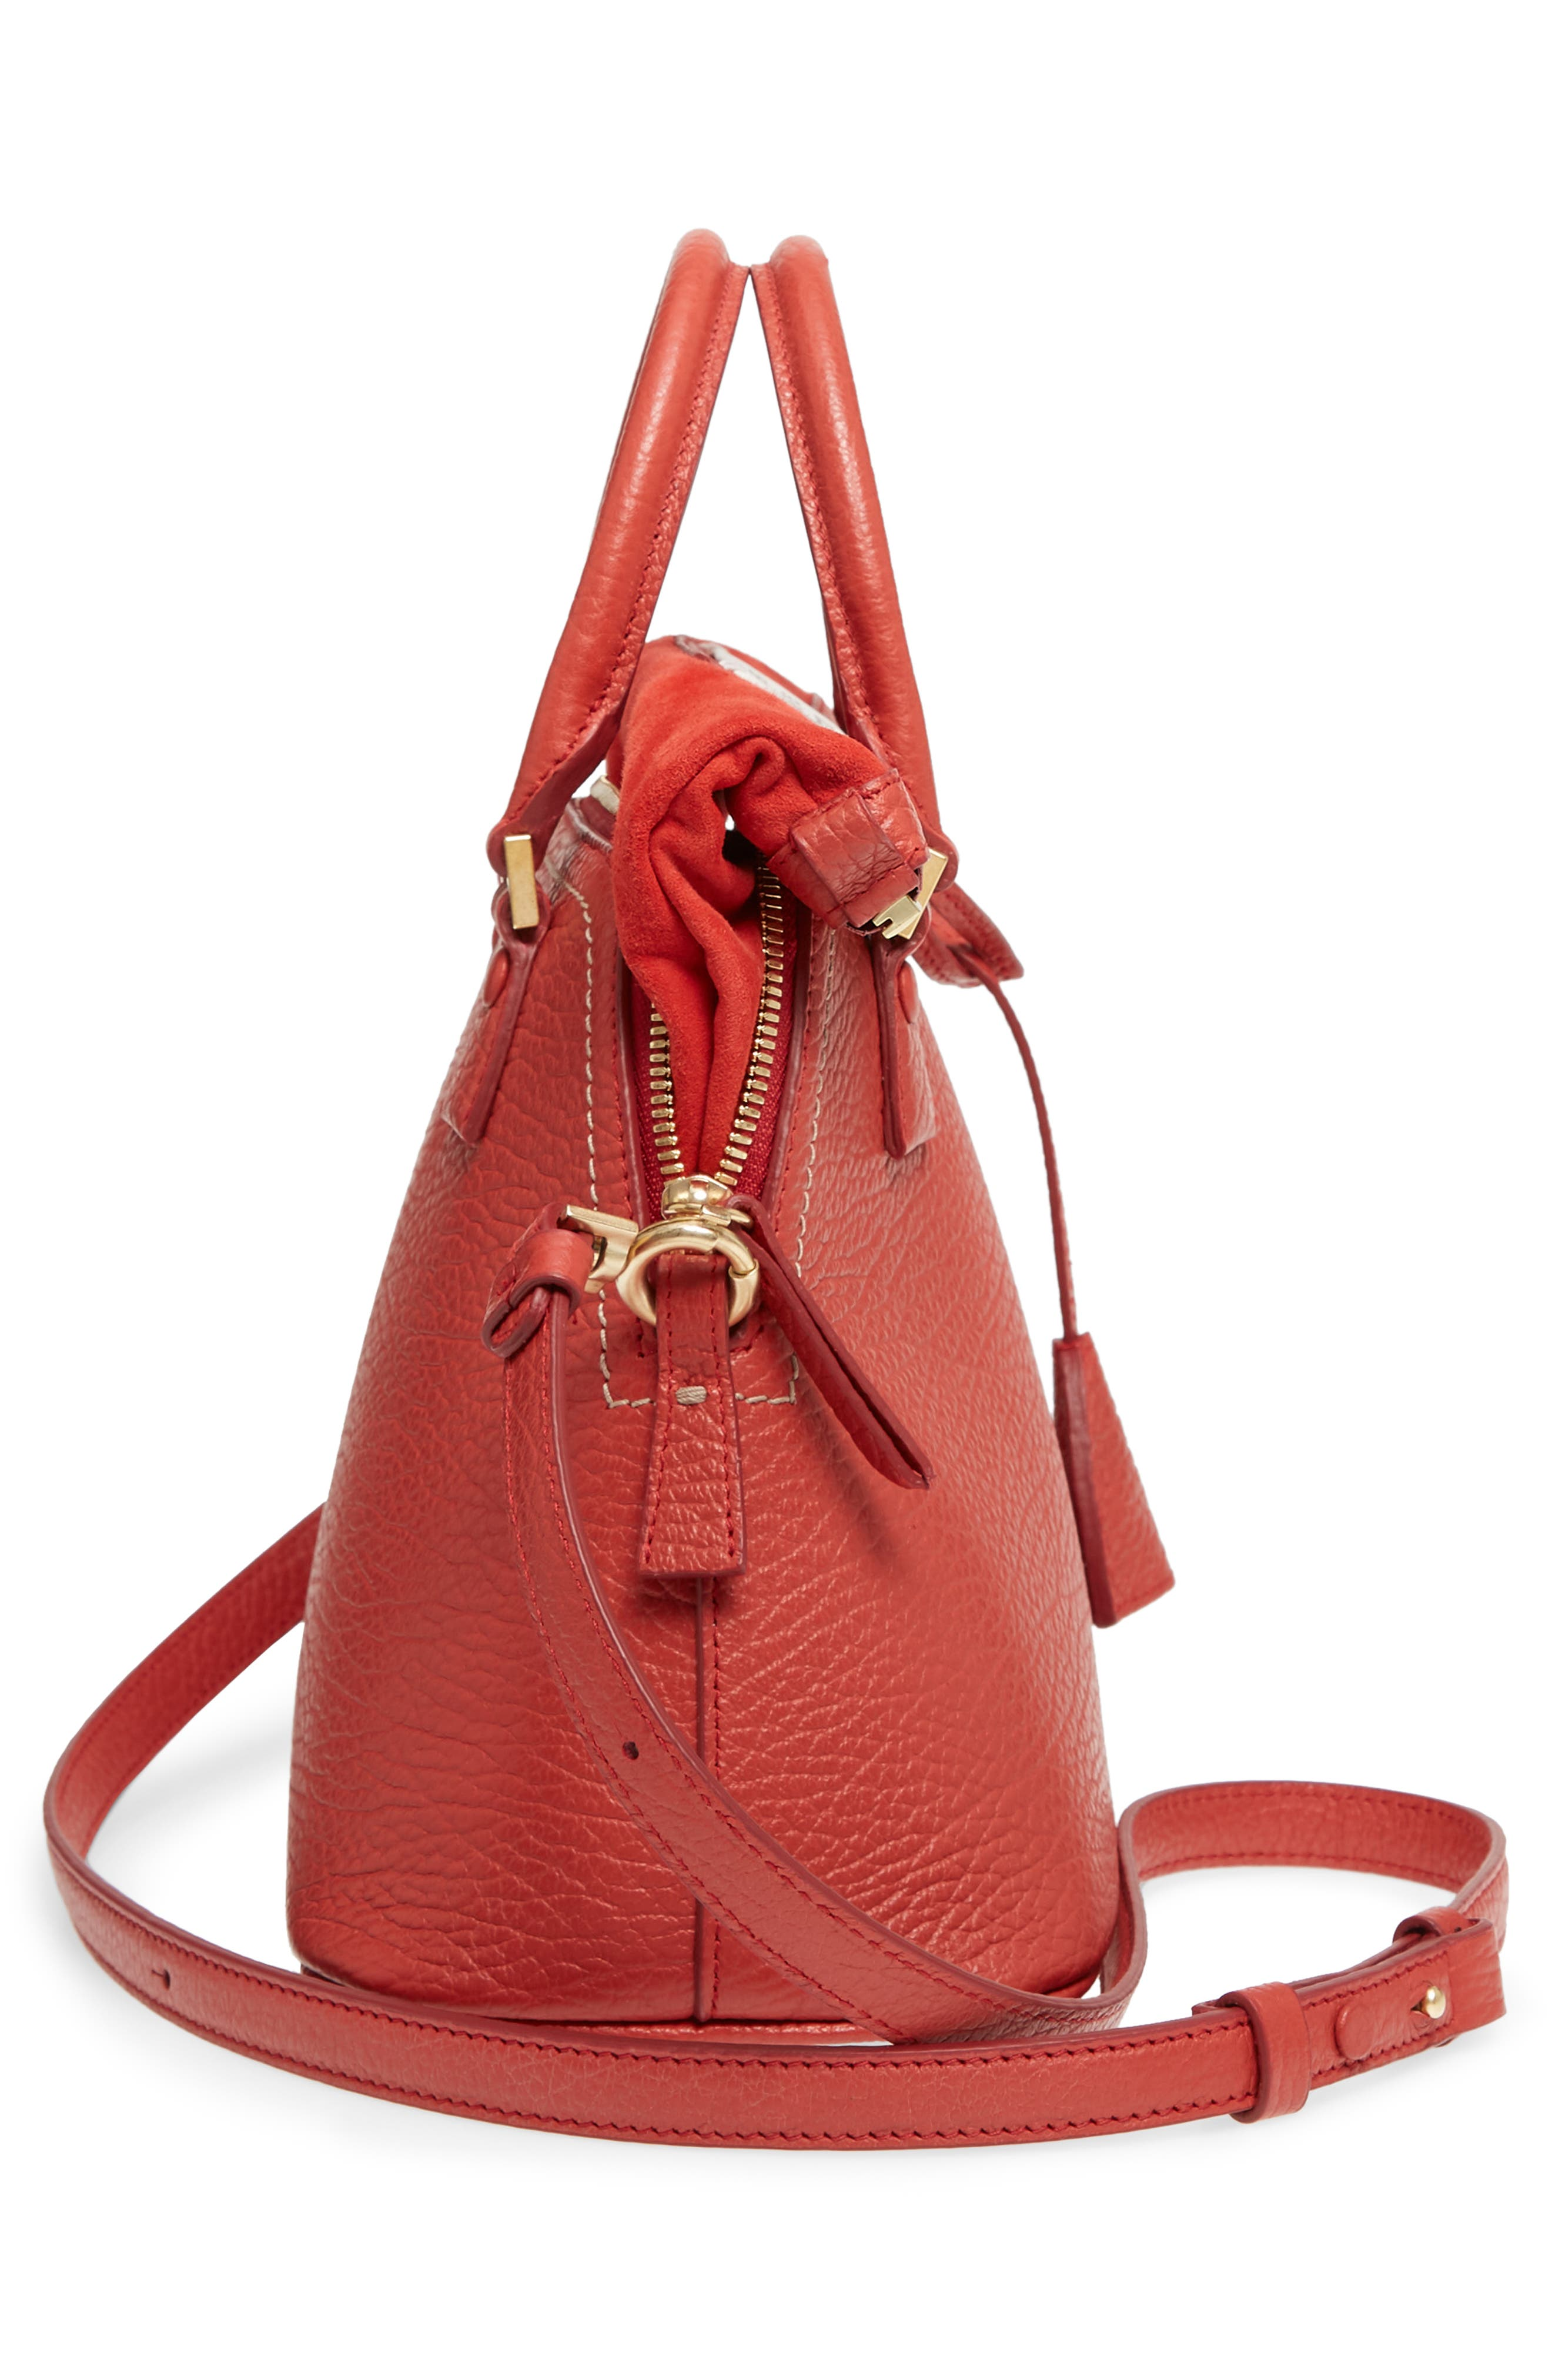 Small 5AC Calfskin Leather Handbag,                             Alternate thumbnail 6, color,                             600